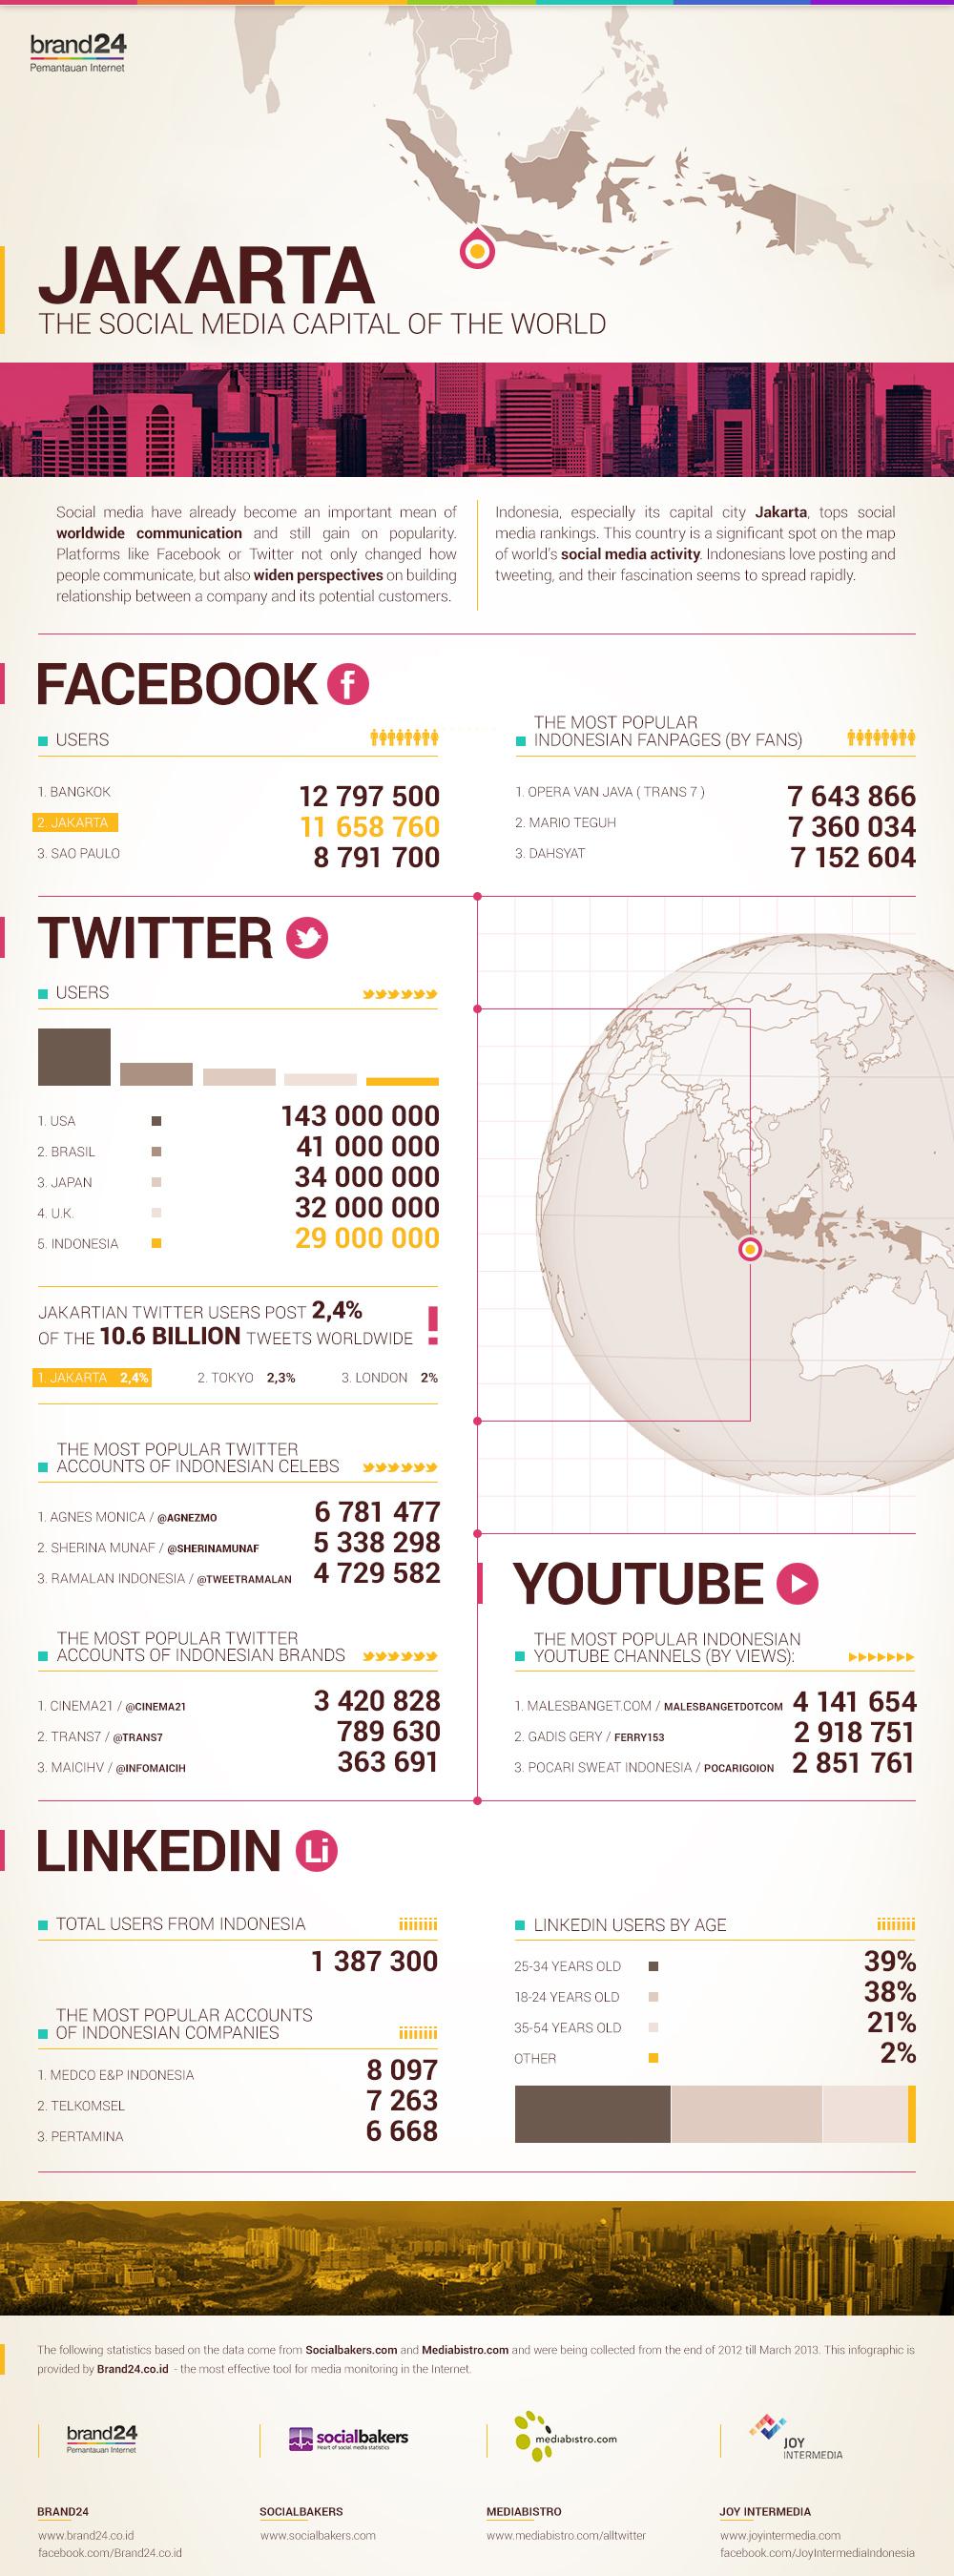 jakarta infographic